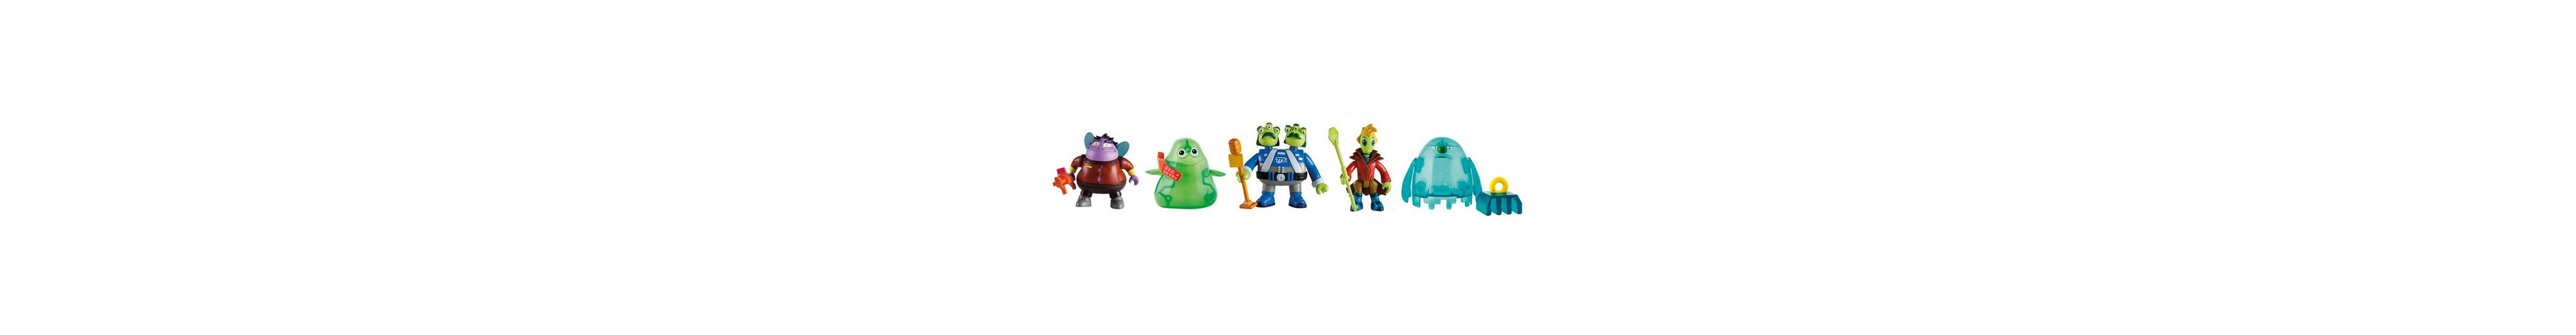 IMC Toys Spielfiguren, »Disneys Miles von Morgen - 5 Alien-Figuren«